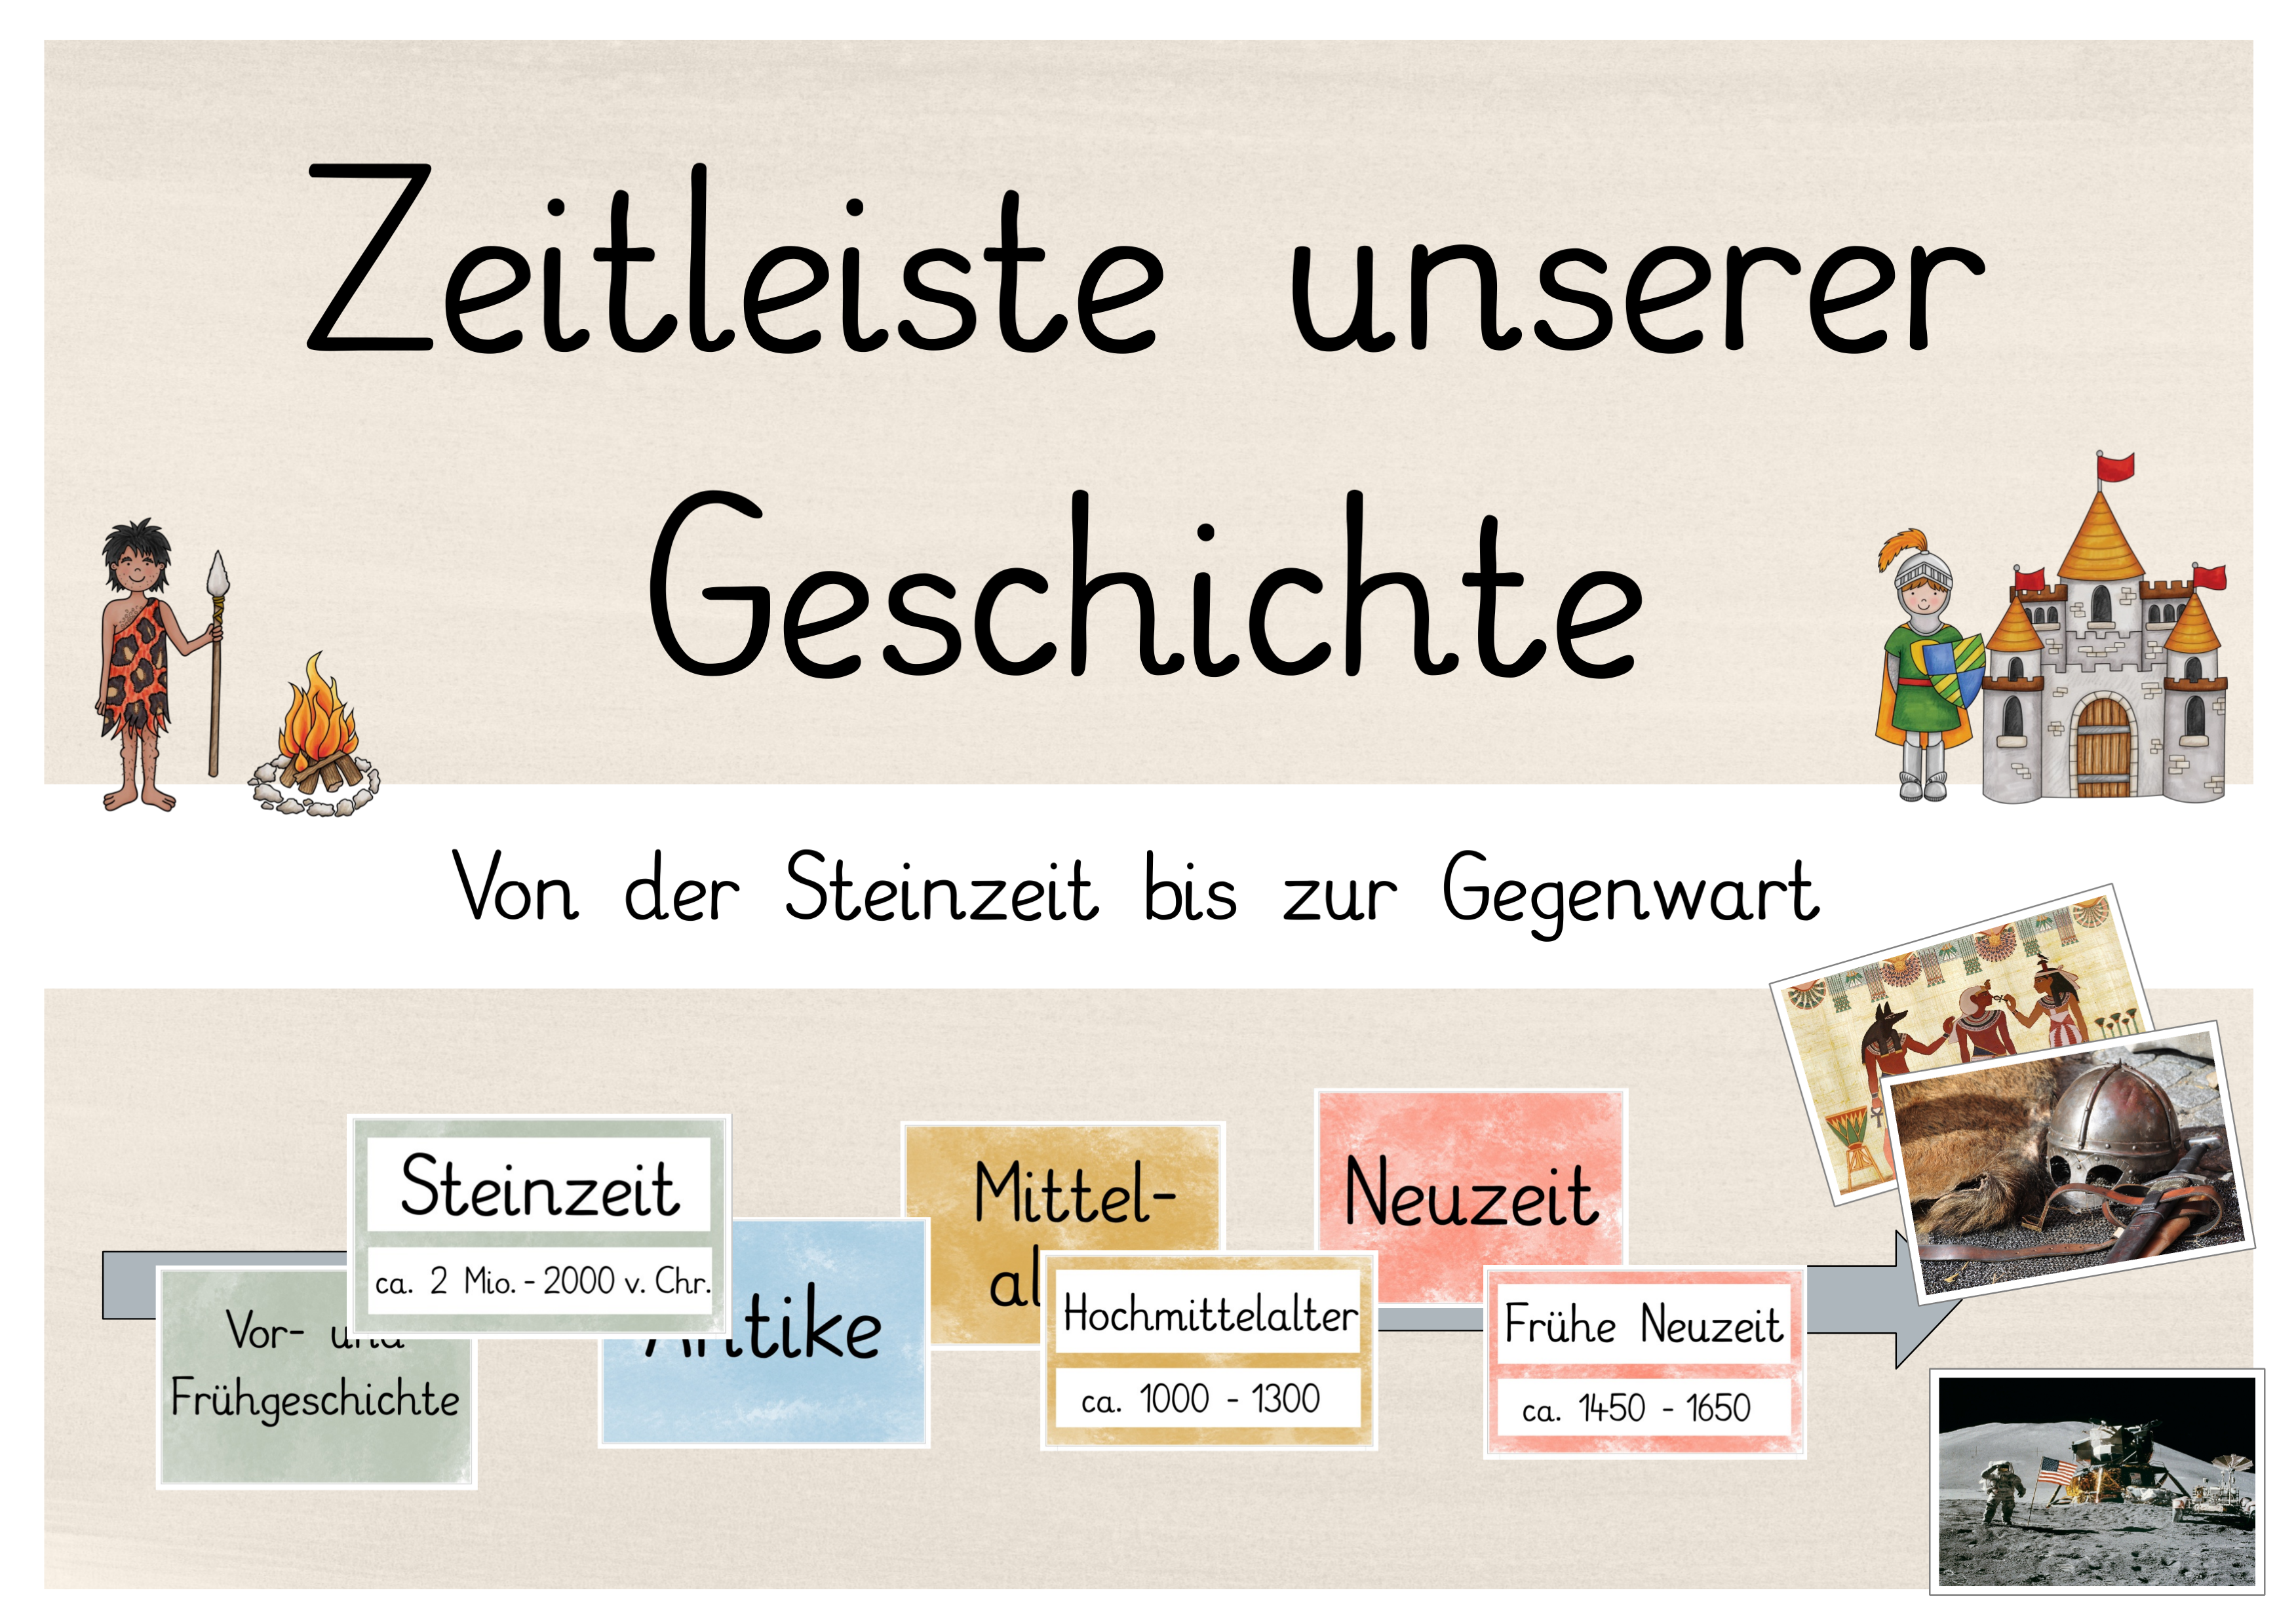 Zeitstrahl Grundschule Unterrichtsmaterial Im Fach Sachunterricht In 2020 Grundschule Kunstunterricht Projekte Geschichte Schule